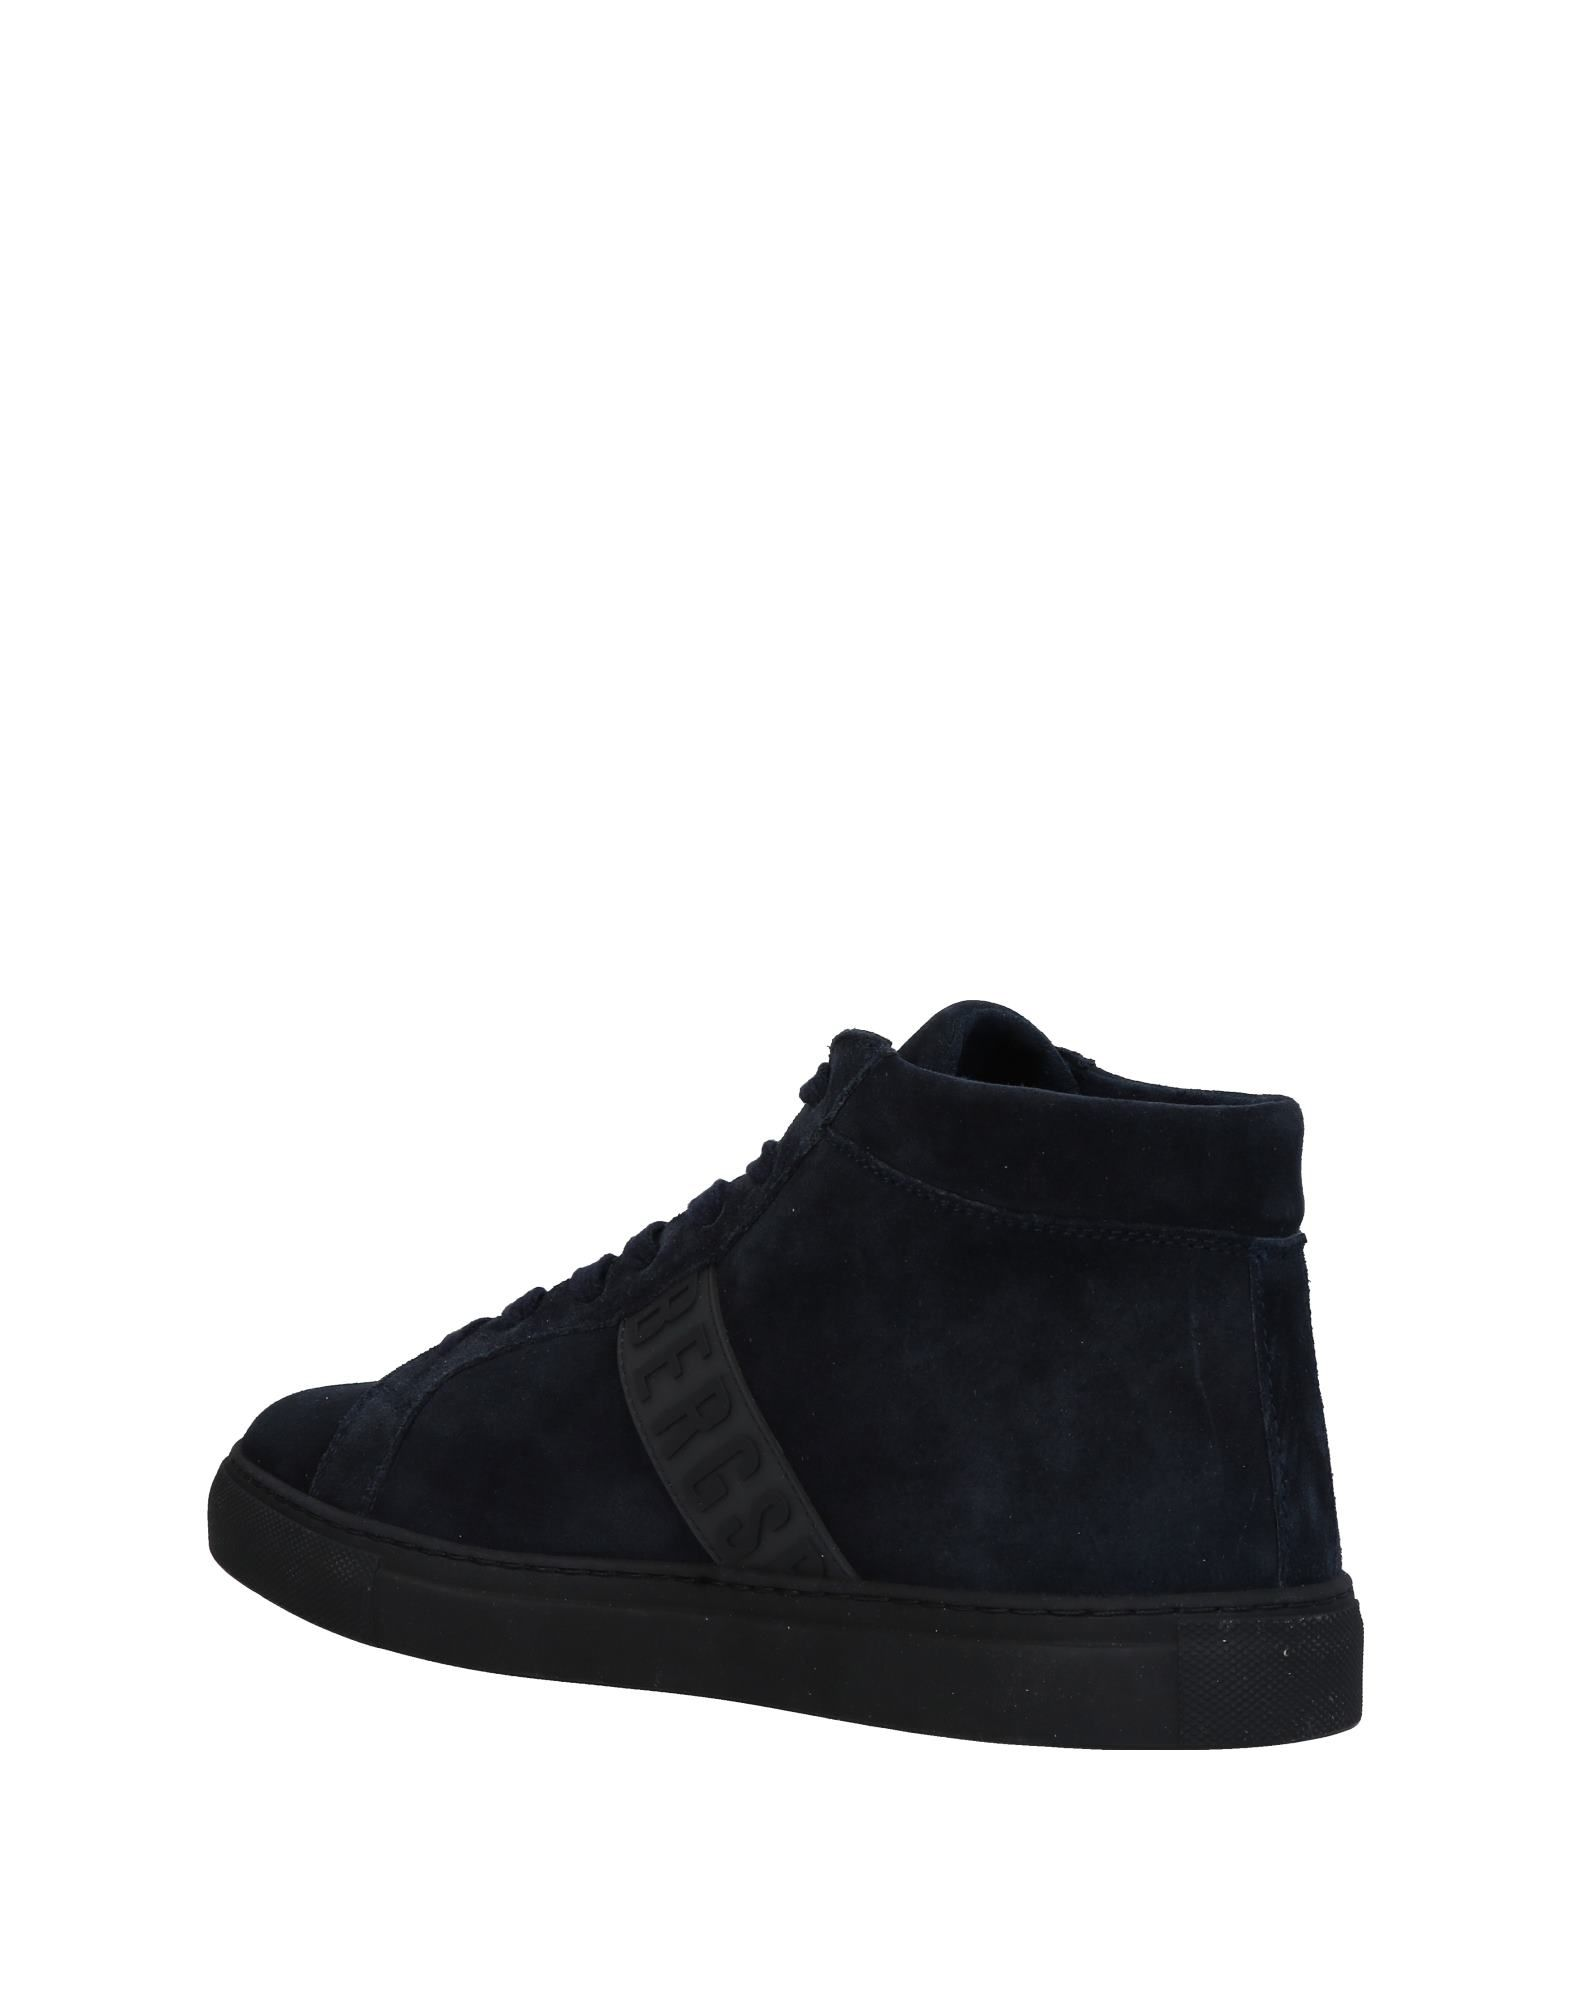 Bikkembergs Sneakers Sneakers Bikkembergs Herren  11450594ON db8543